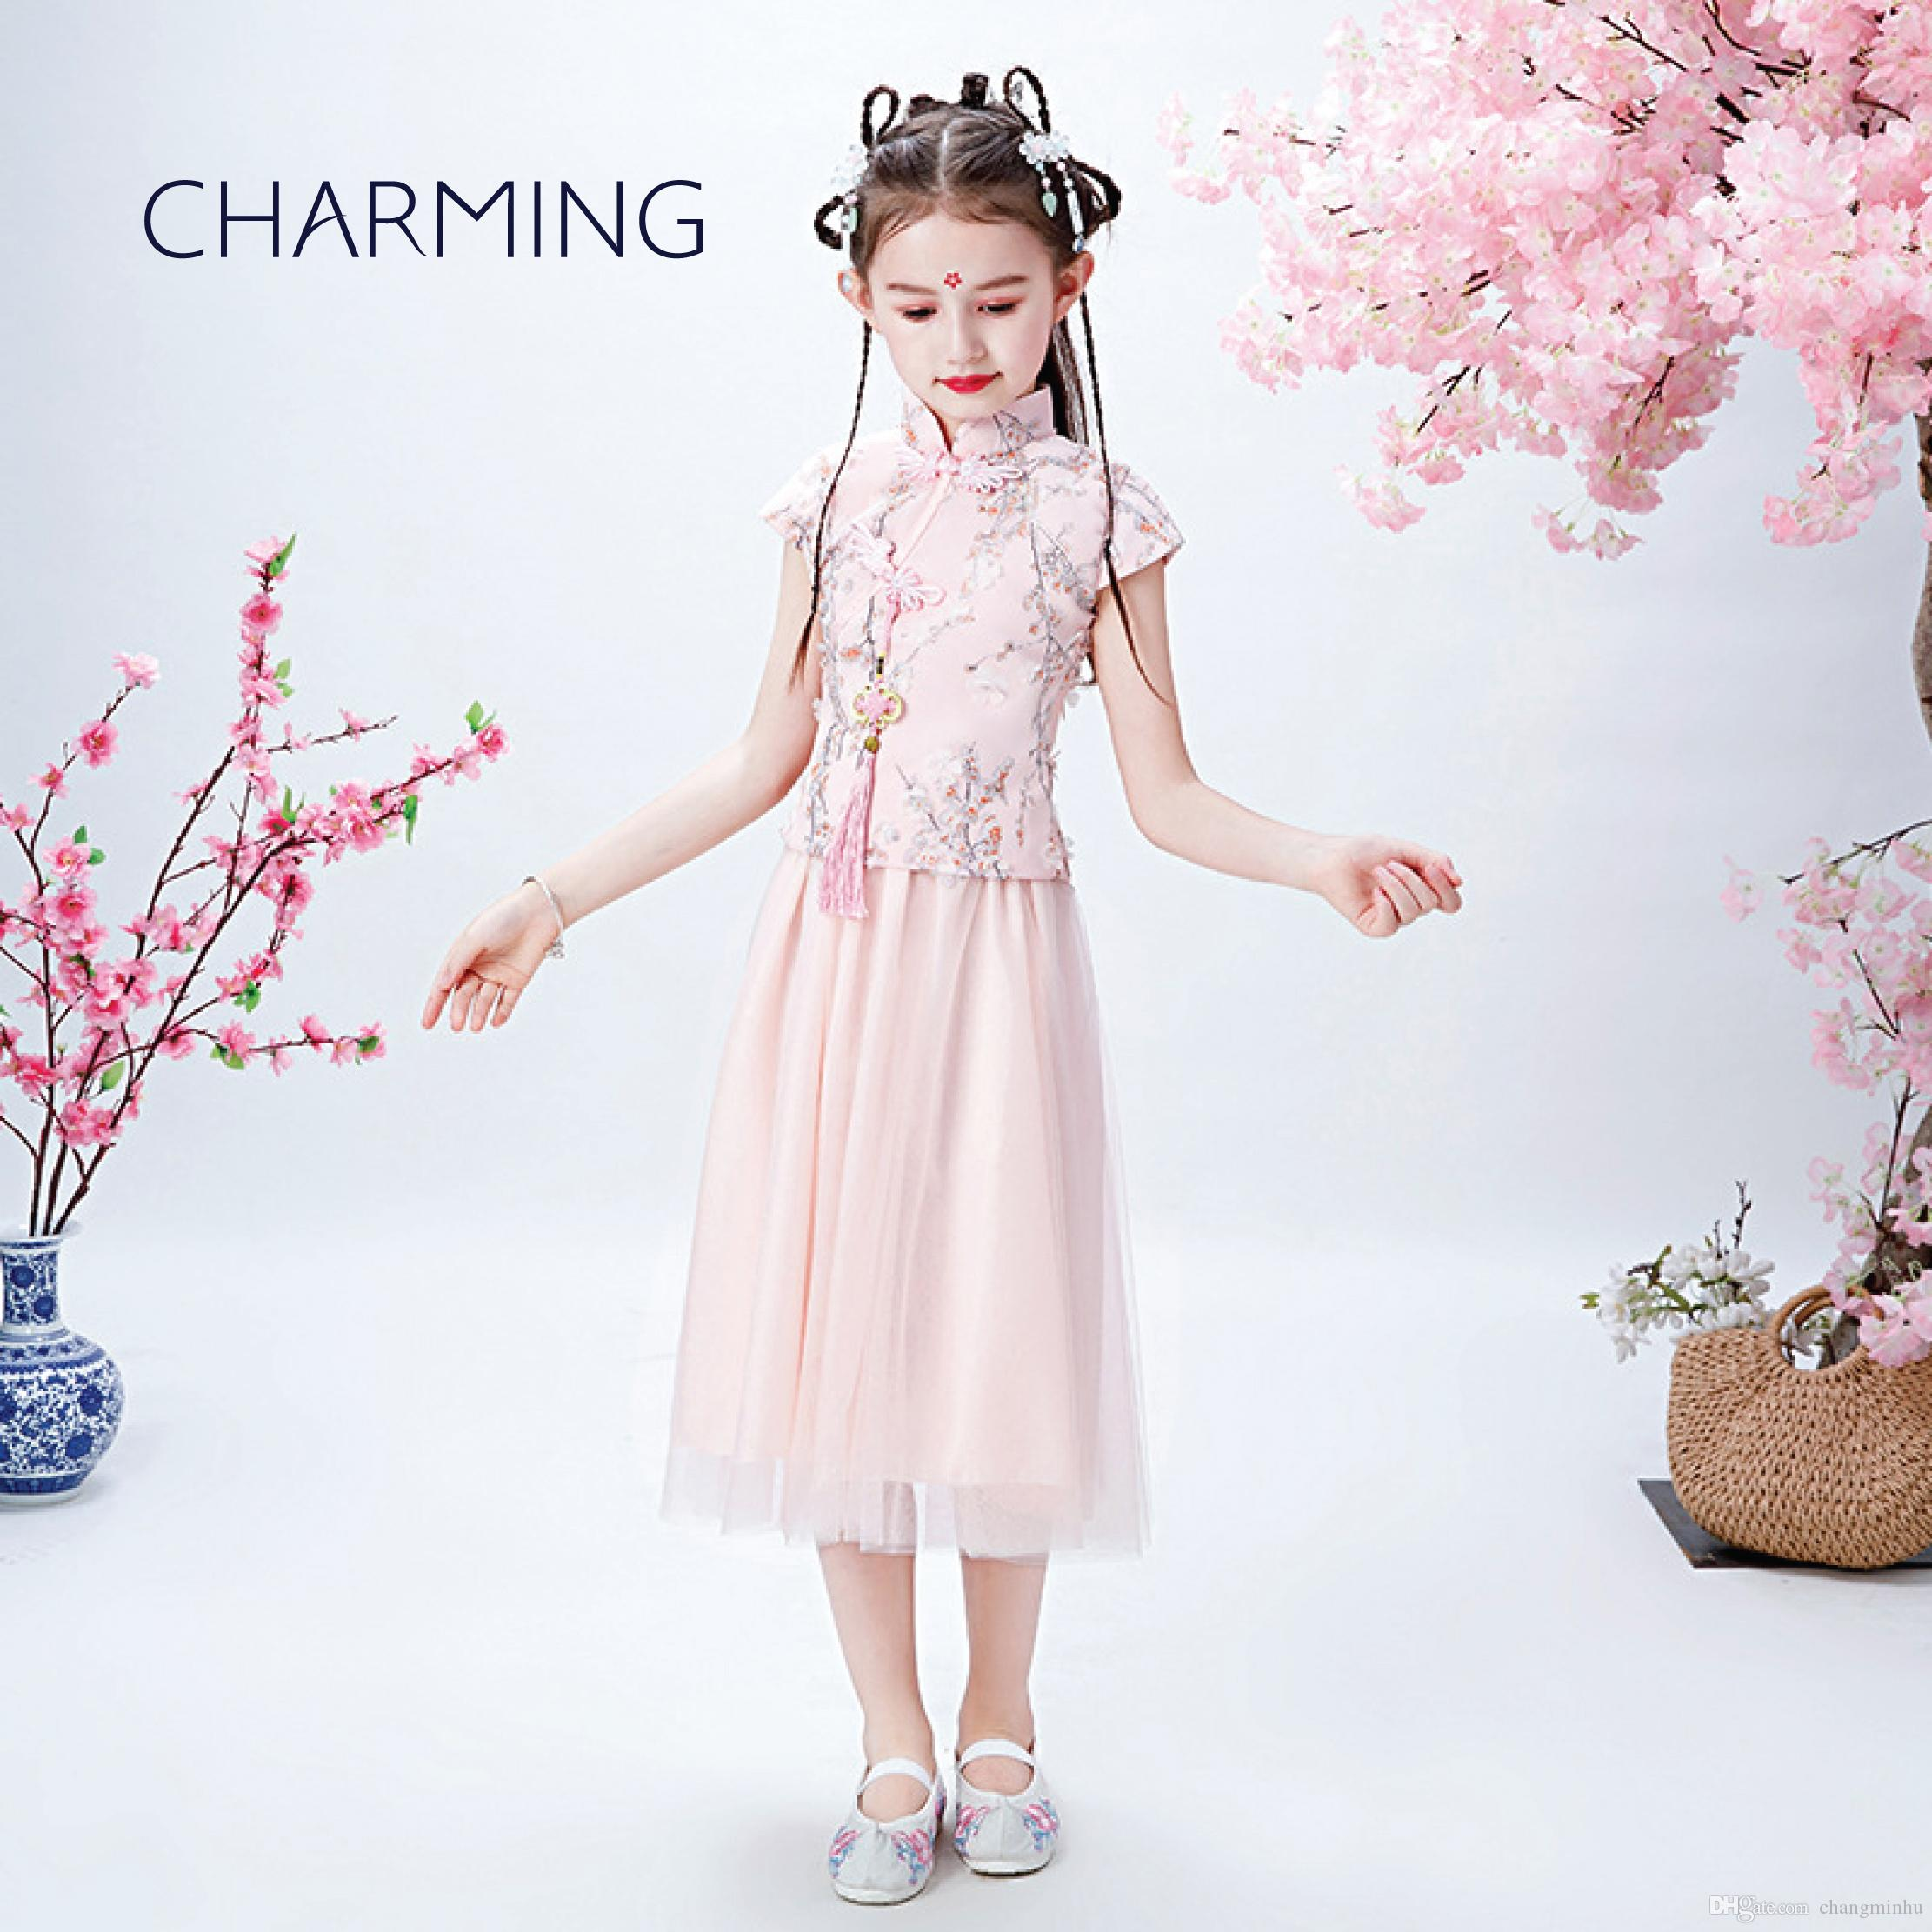 children dress Children's Chinese style dress girls holiday dress pretty dresses for girl kids party dresses